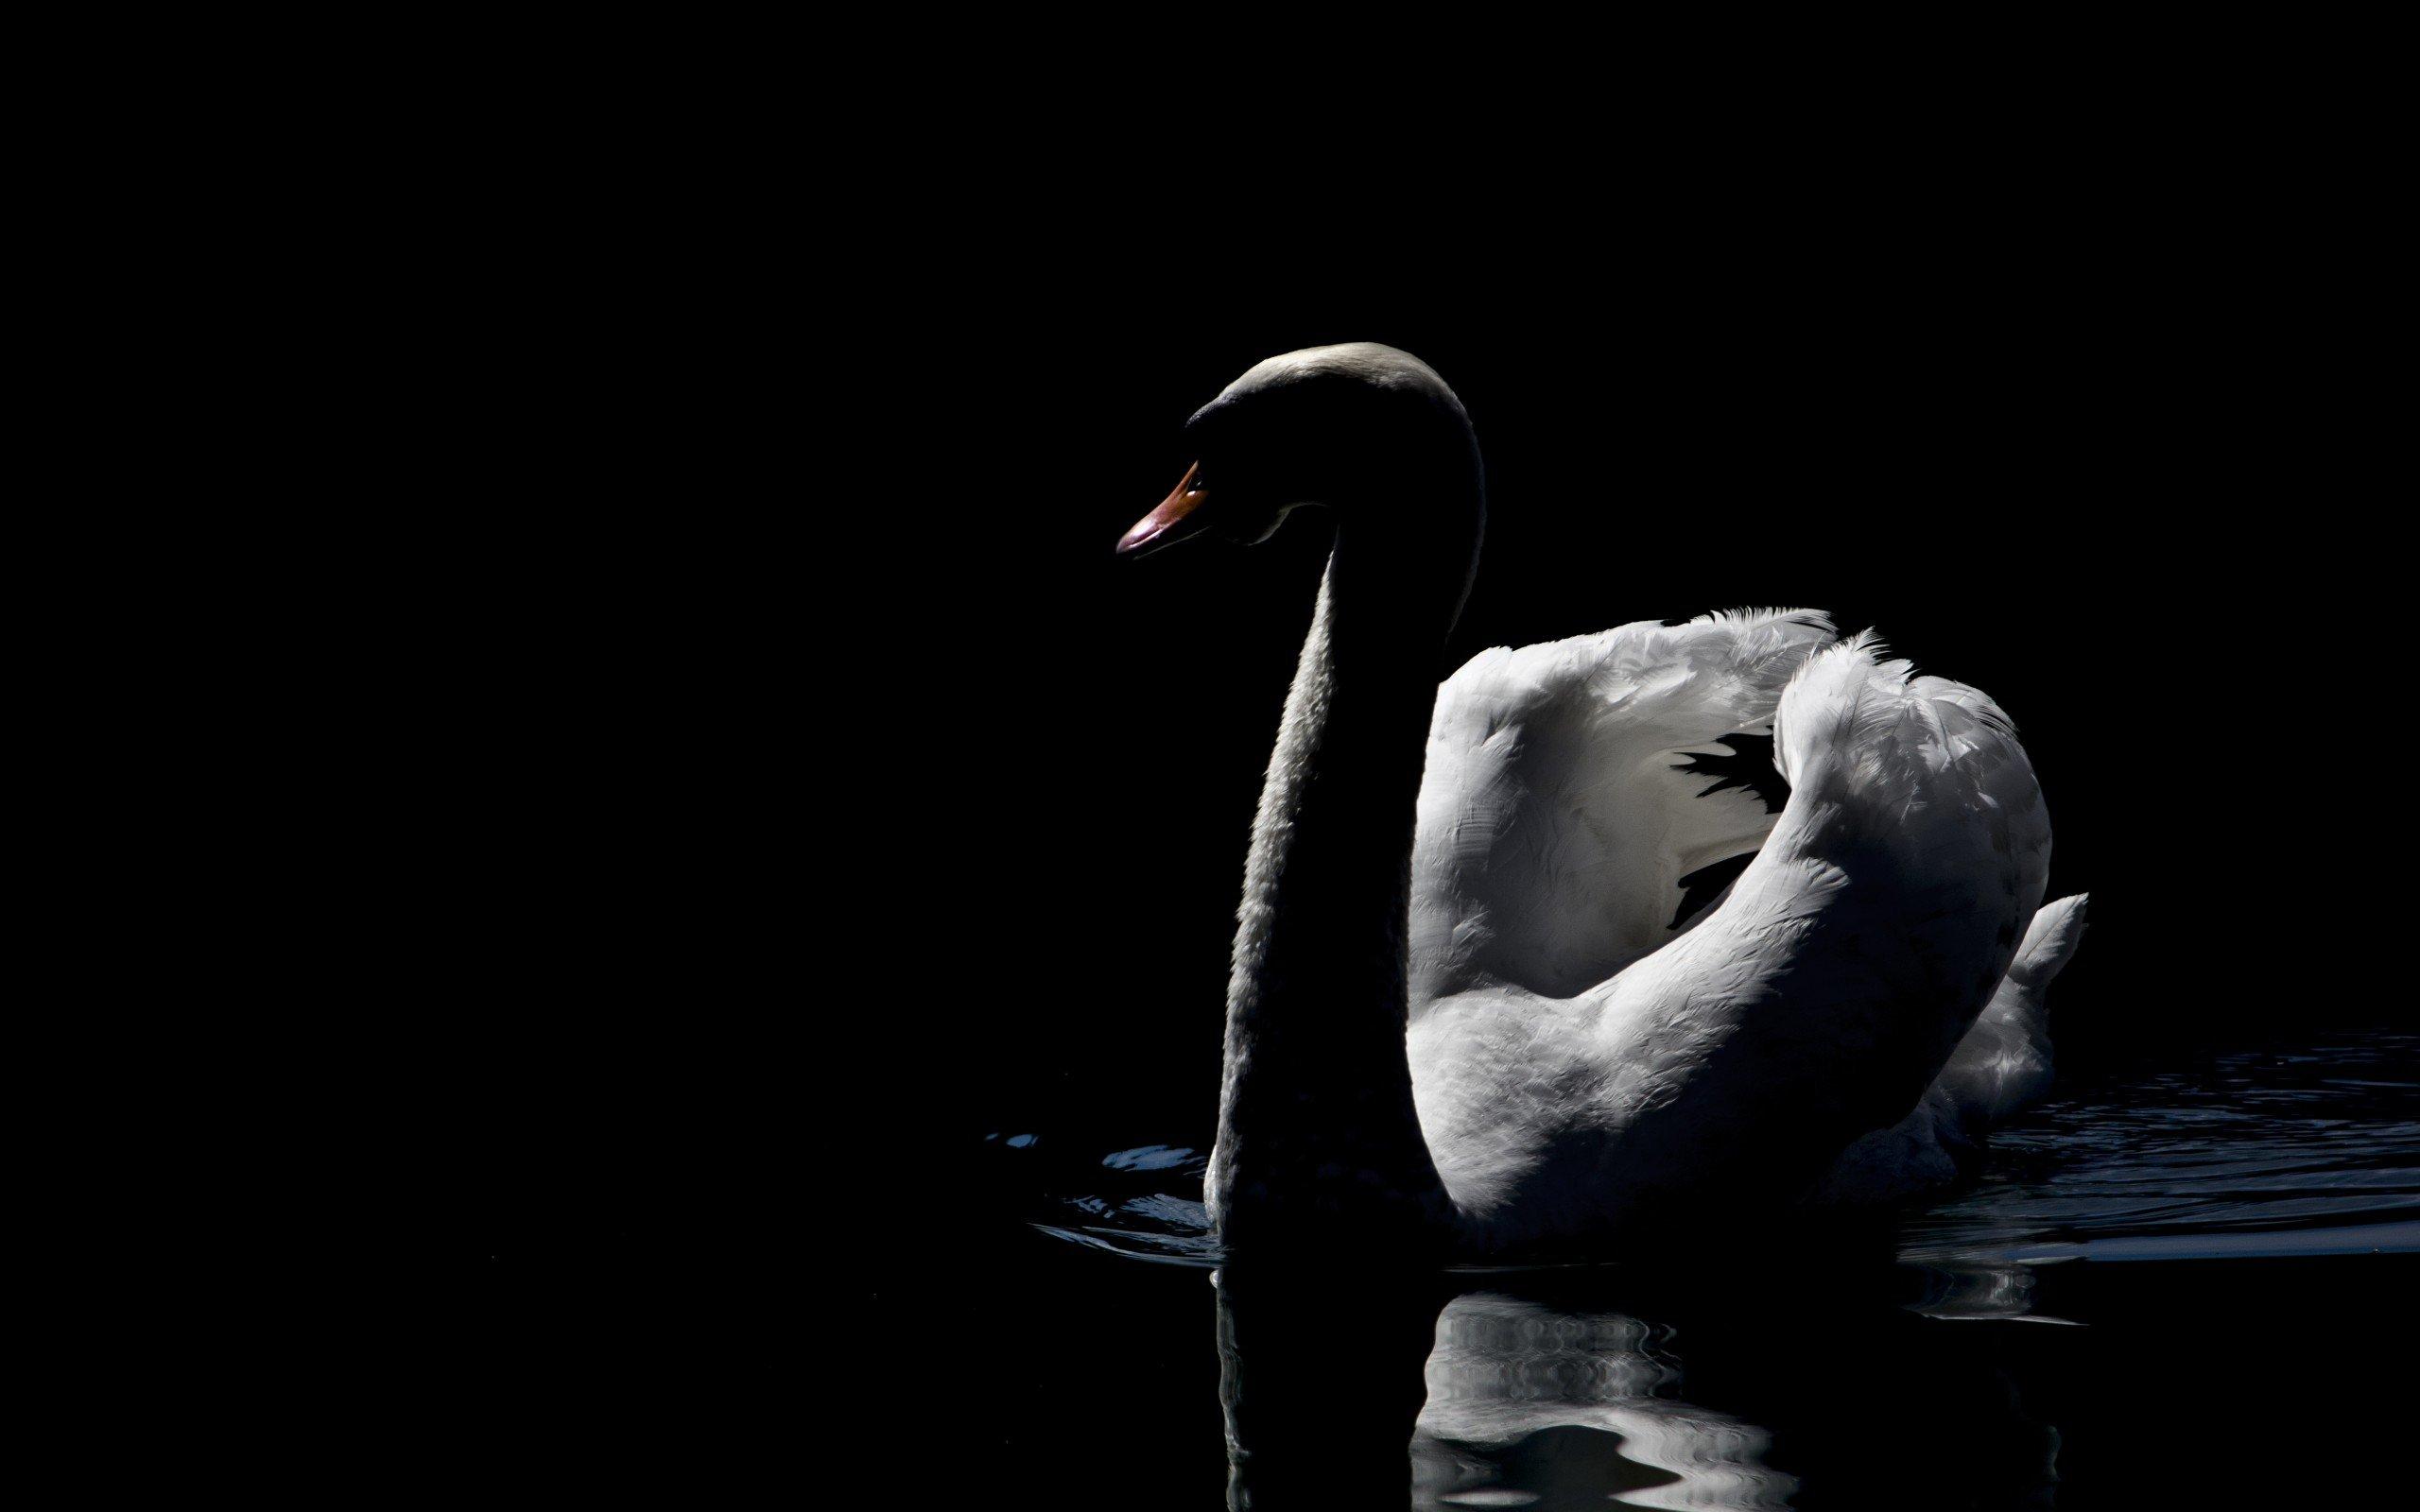 Black Swan Bird Wallpaper wwwpixsharkcom   Images 2560x1600